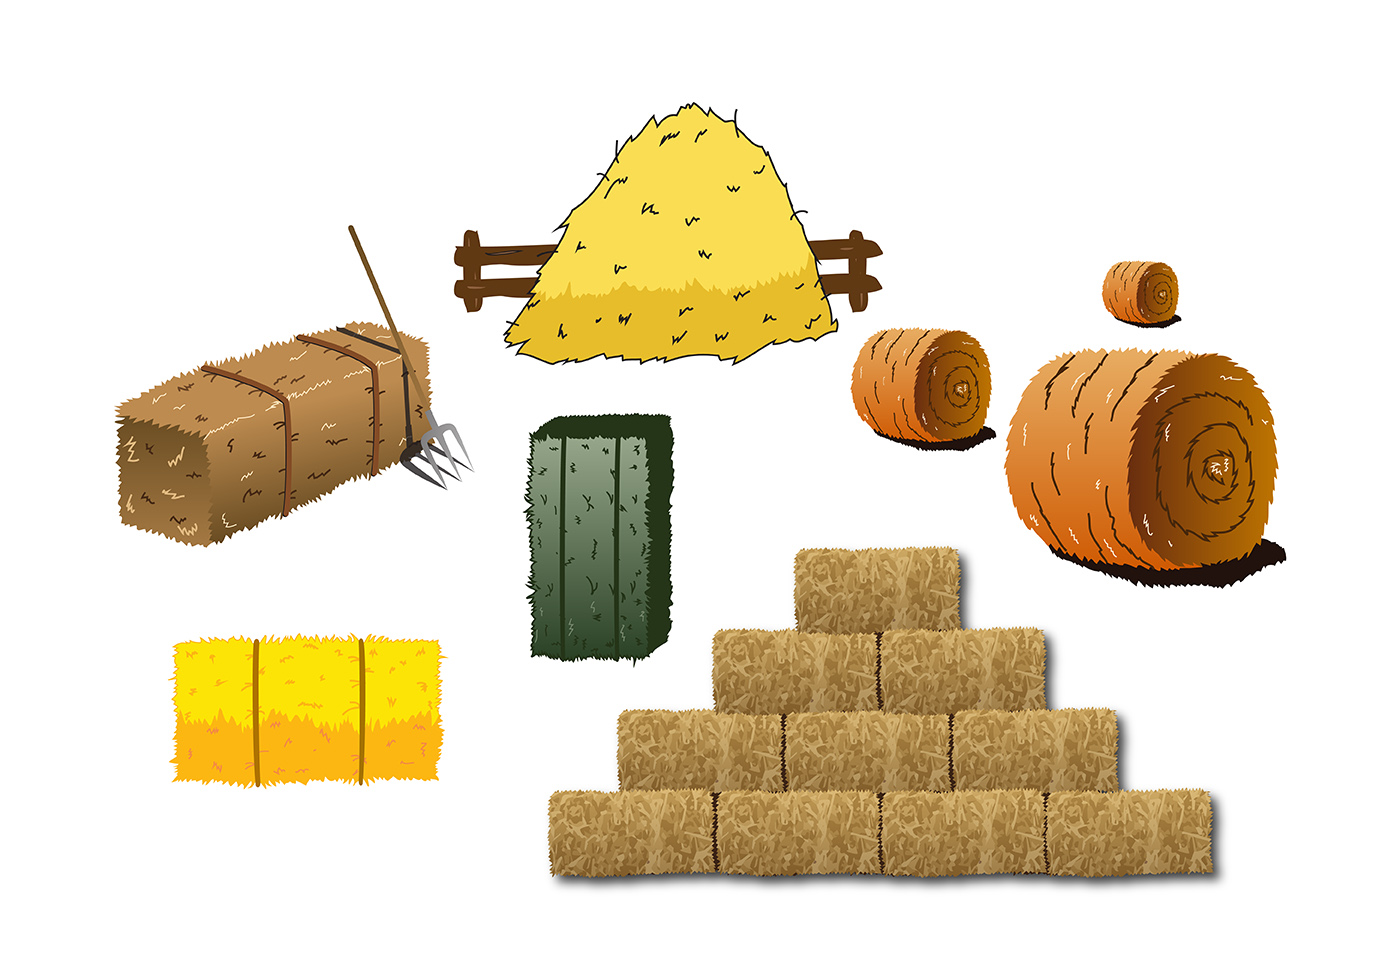 Hay Bale Clip Art : Hay bale vector download free art stock graphics